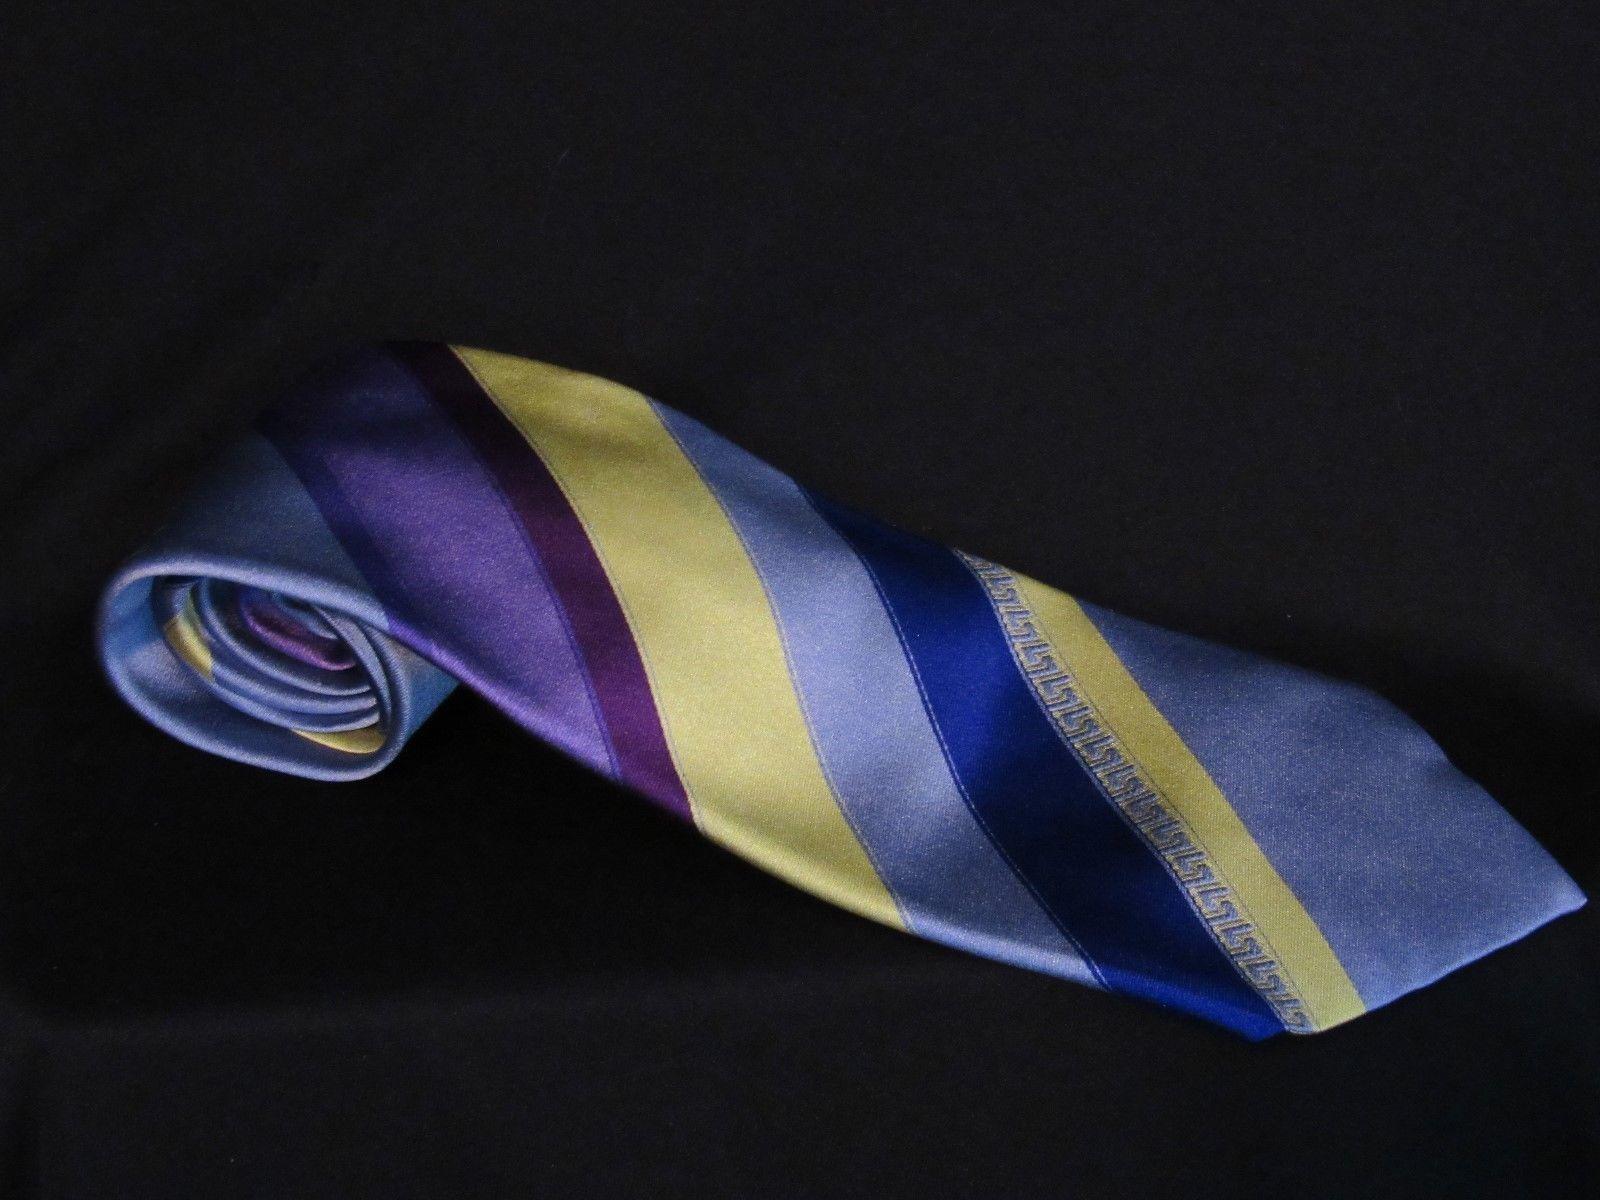 b3f0a6728b96 Gianni Versace Tie, Blue, Gray, Purple & Yellow Stripes, 100% Silk